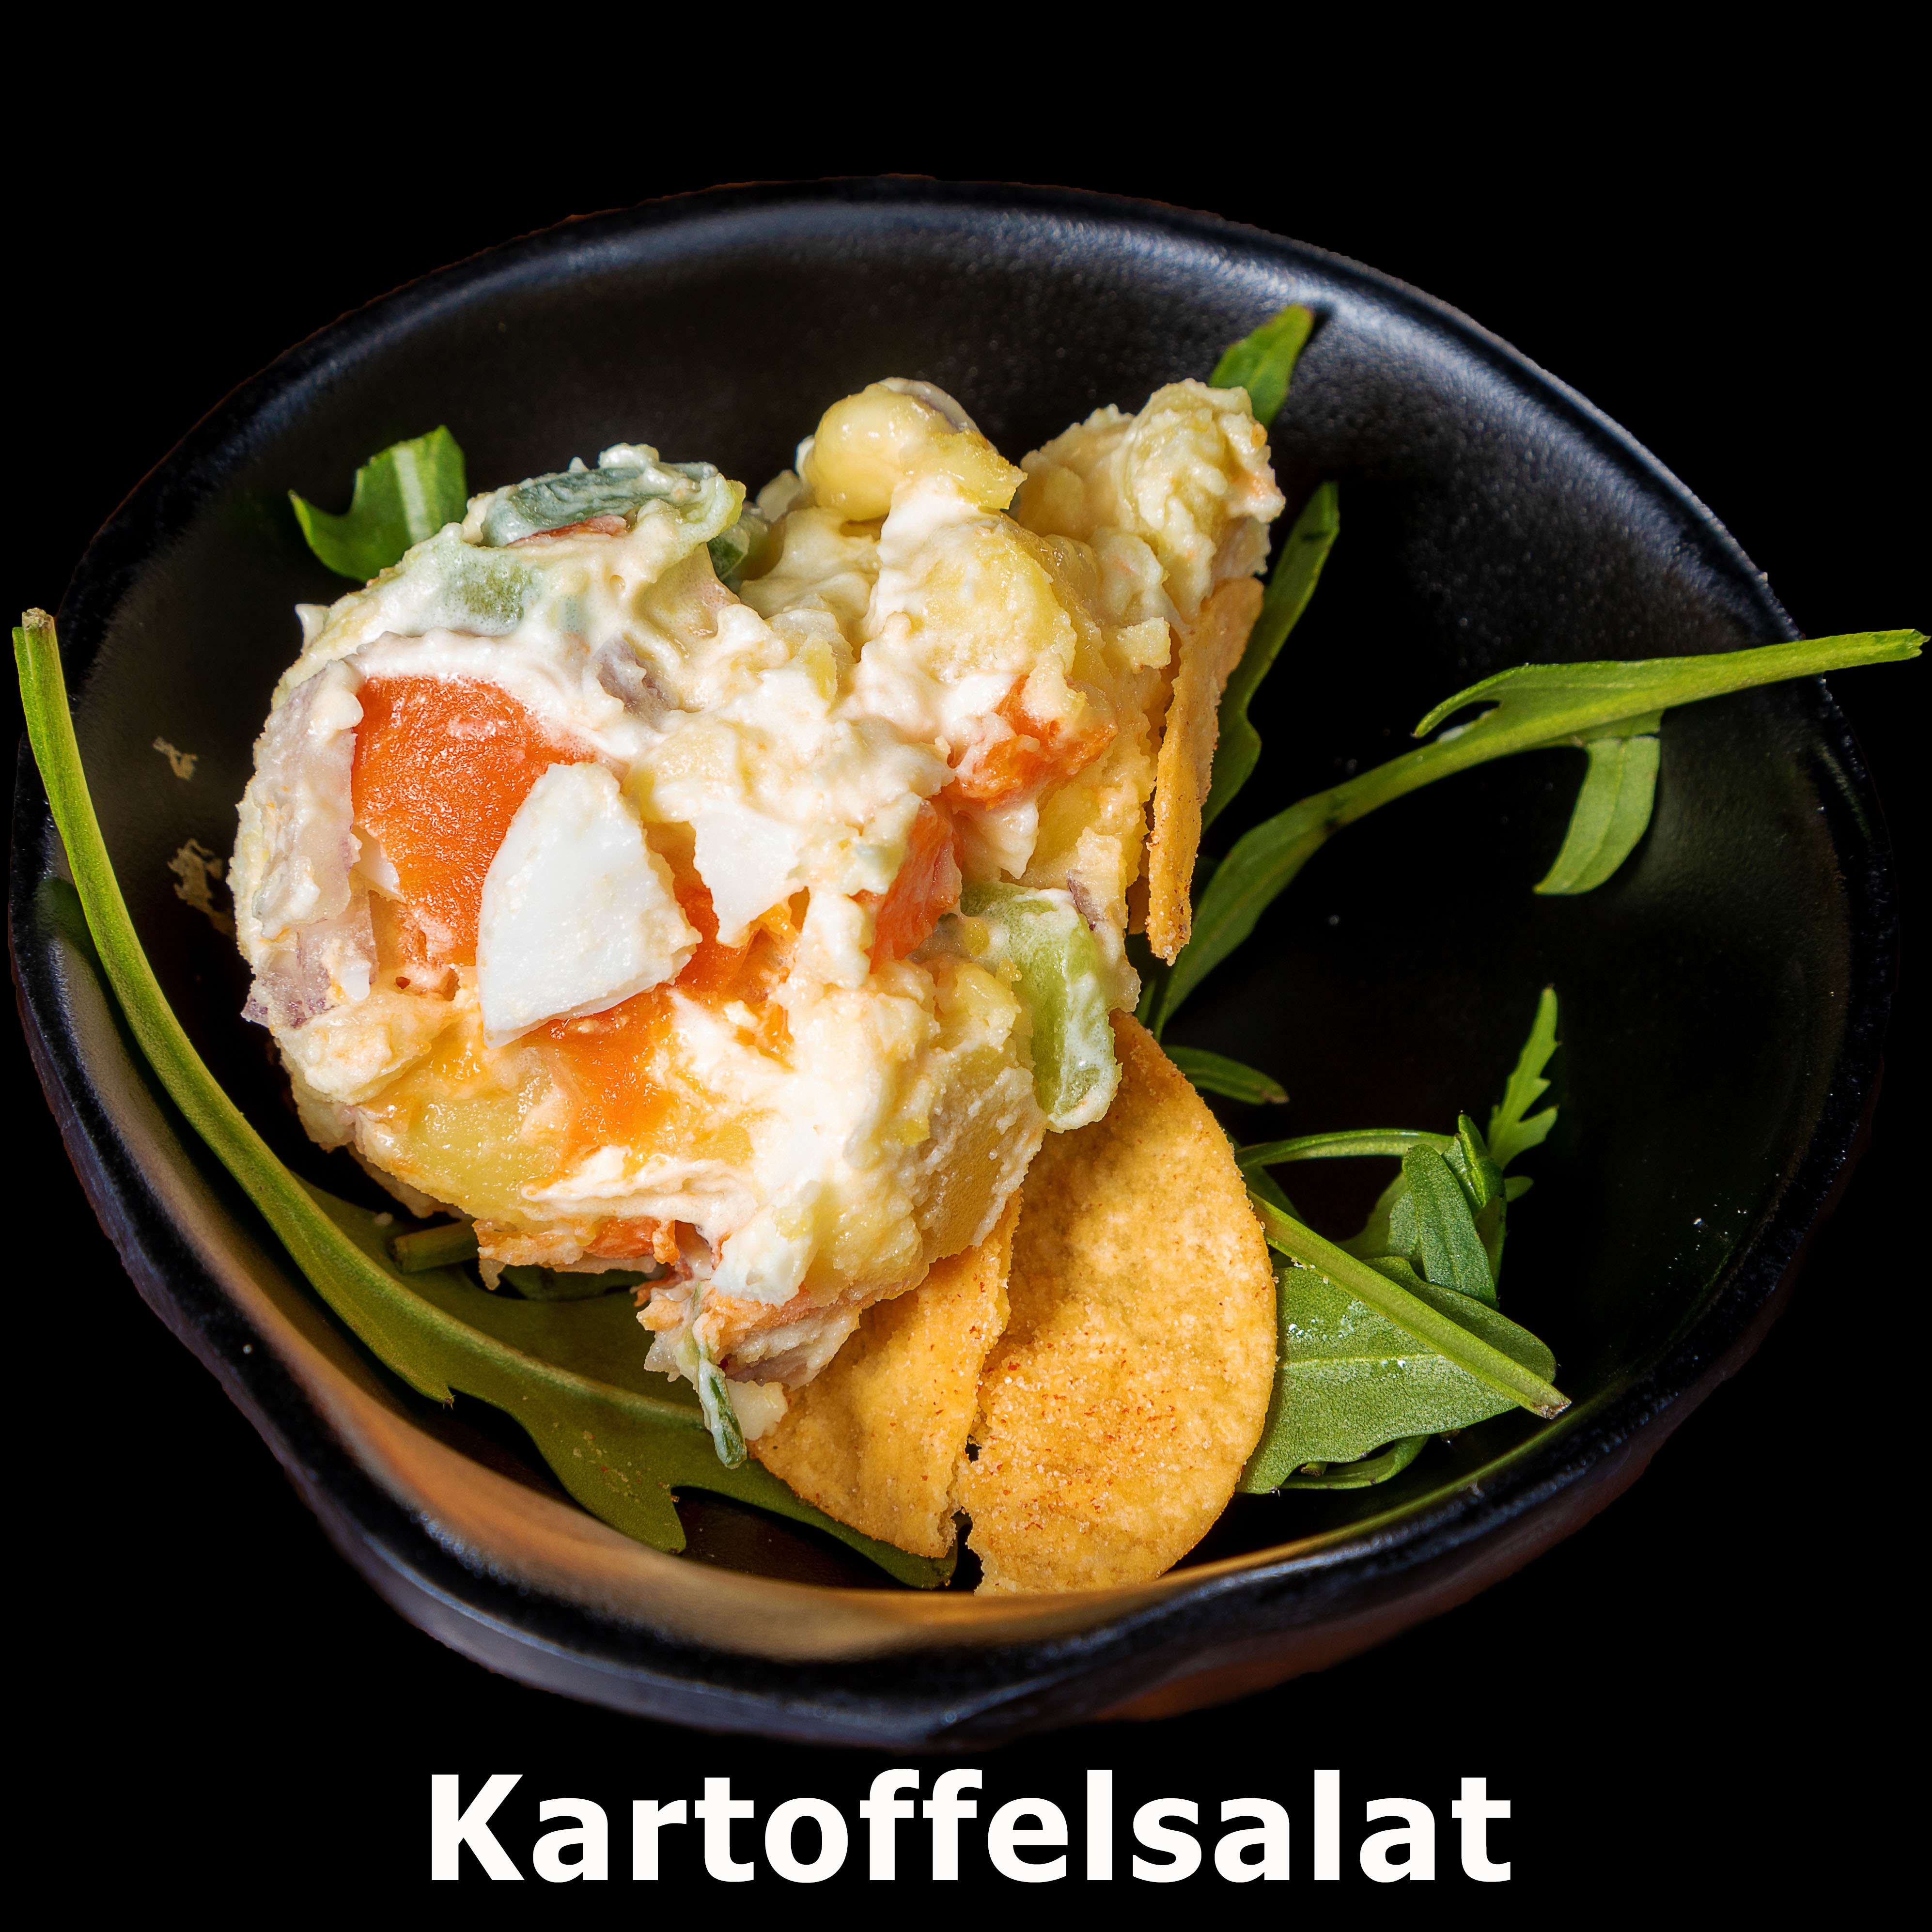 9. Kartoffelsalat